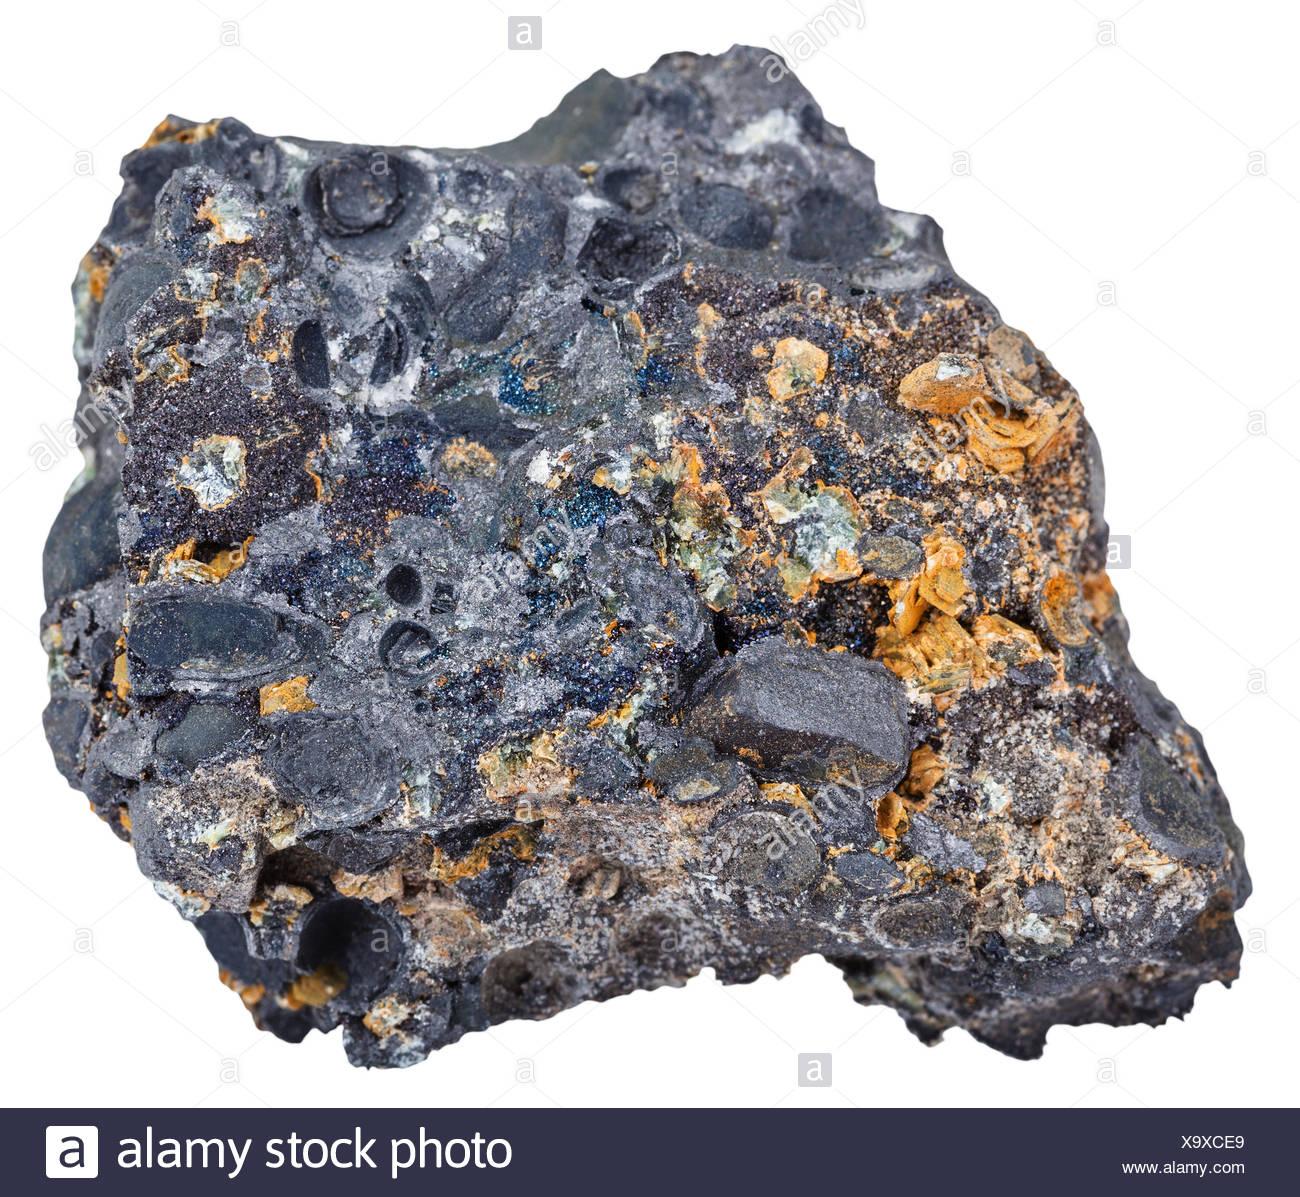 32abdff4f59 hematita-minerio-de-ferro-com-cristais-de-magnetita-x9xce9.jpg